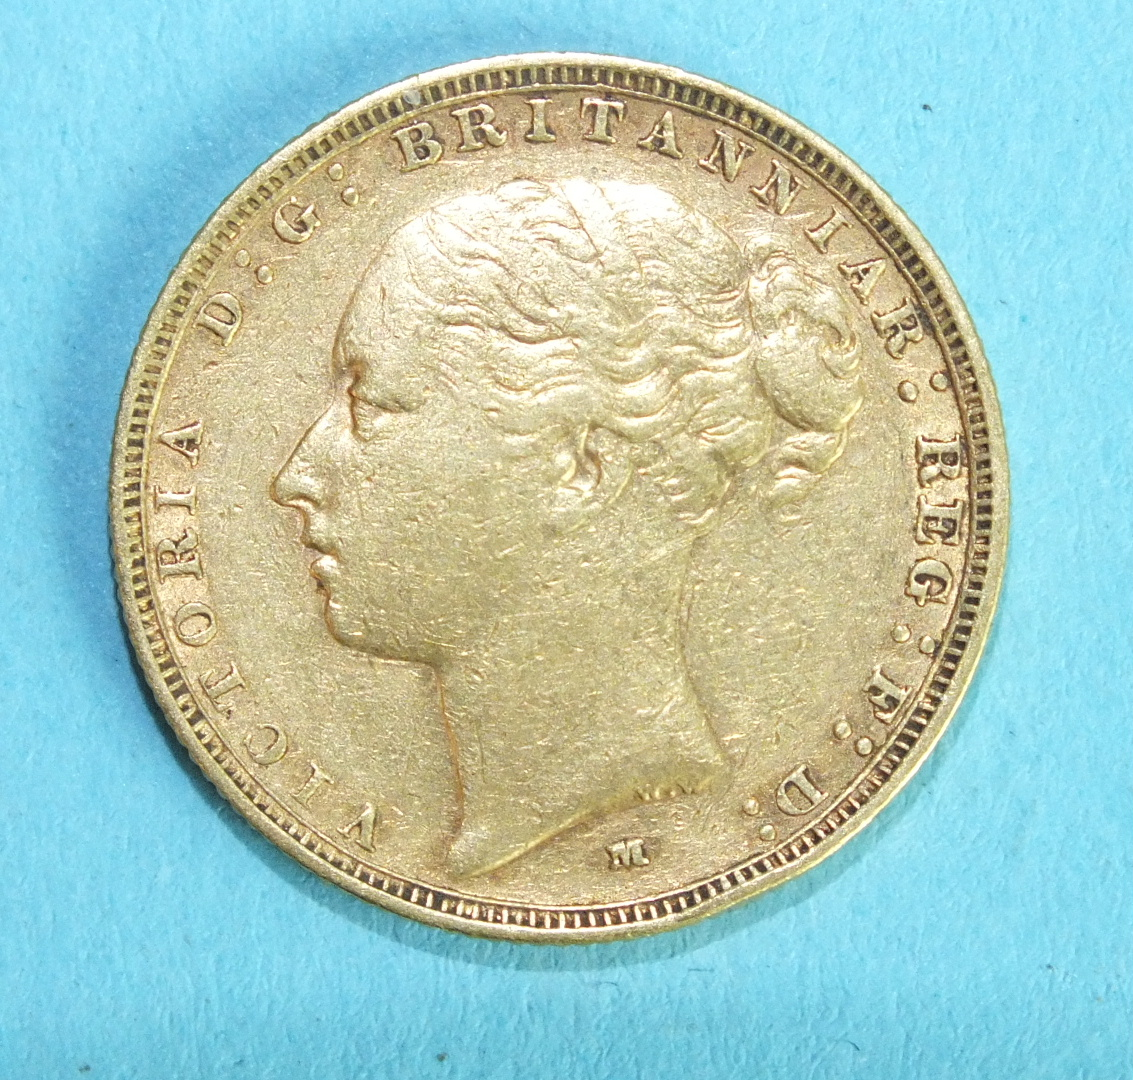 Lot 352 - A Queen Victoria 1883 sovereign.